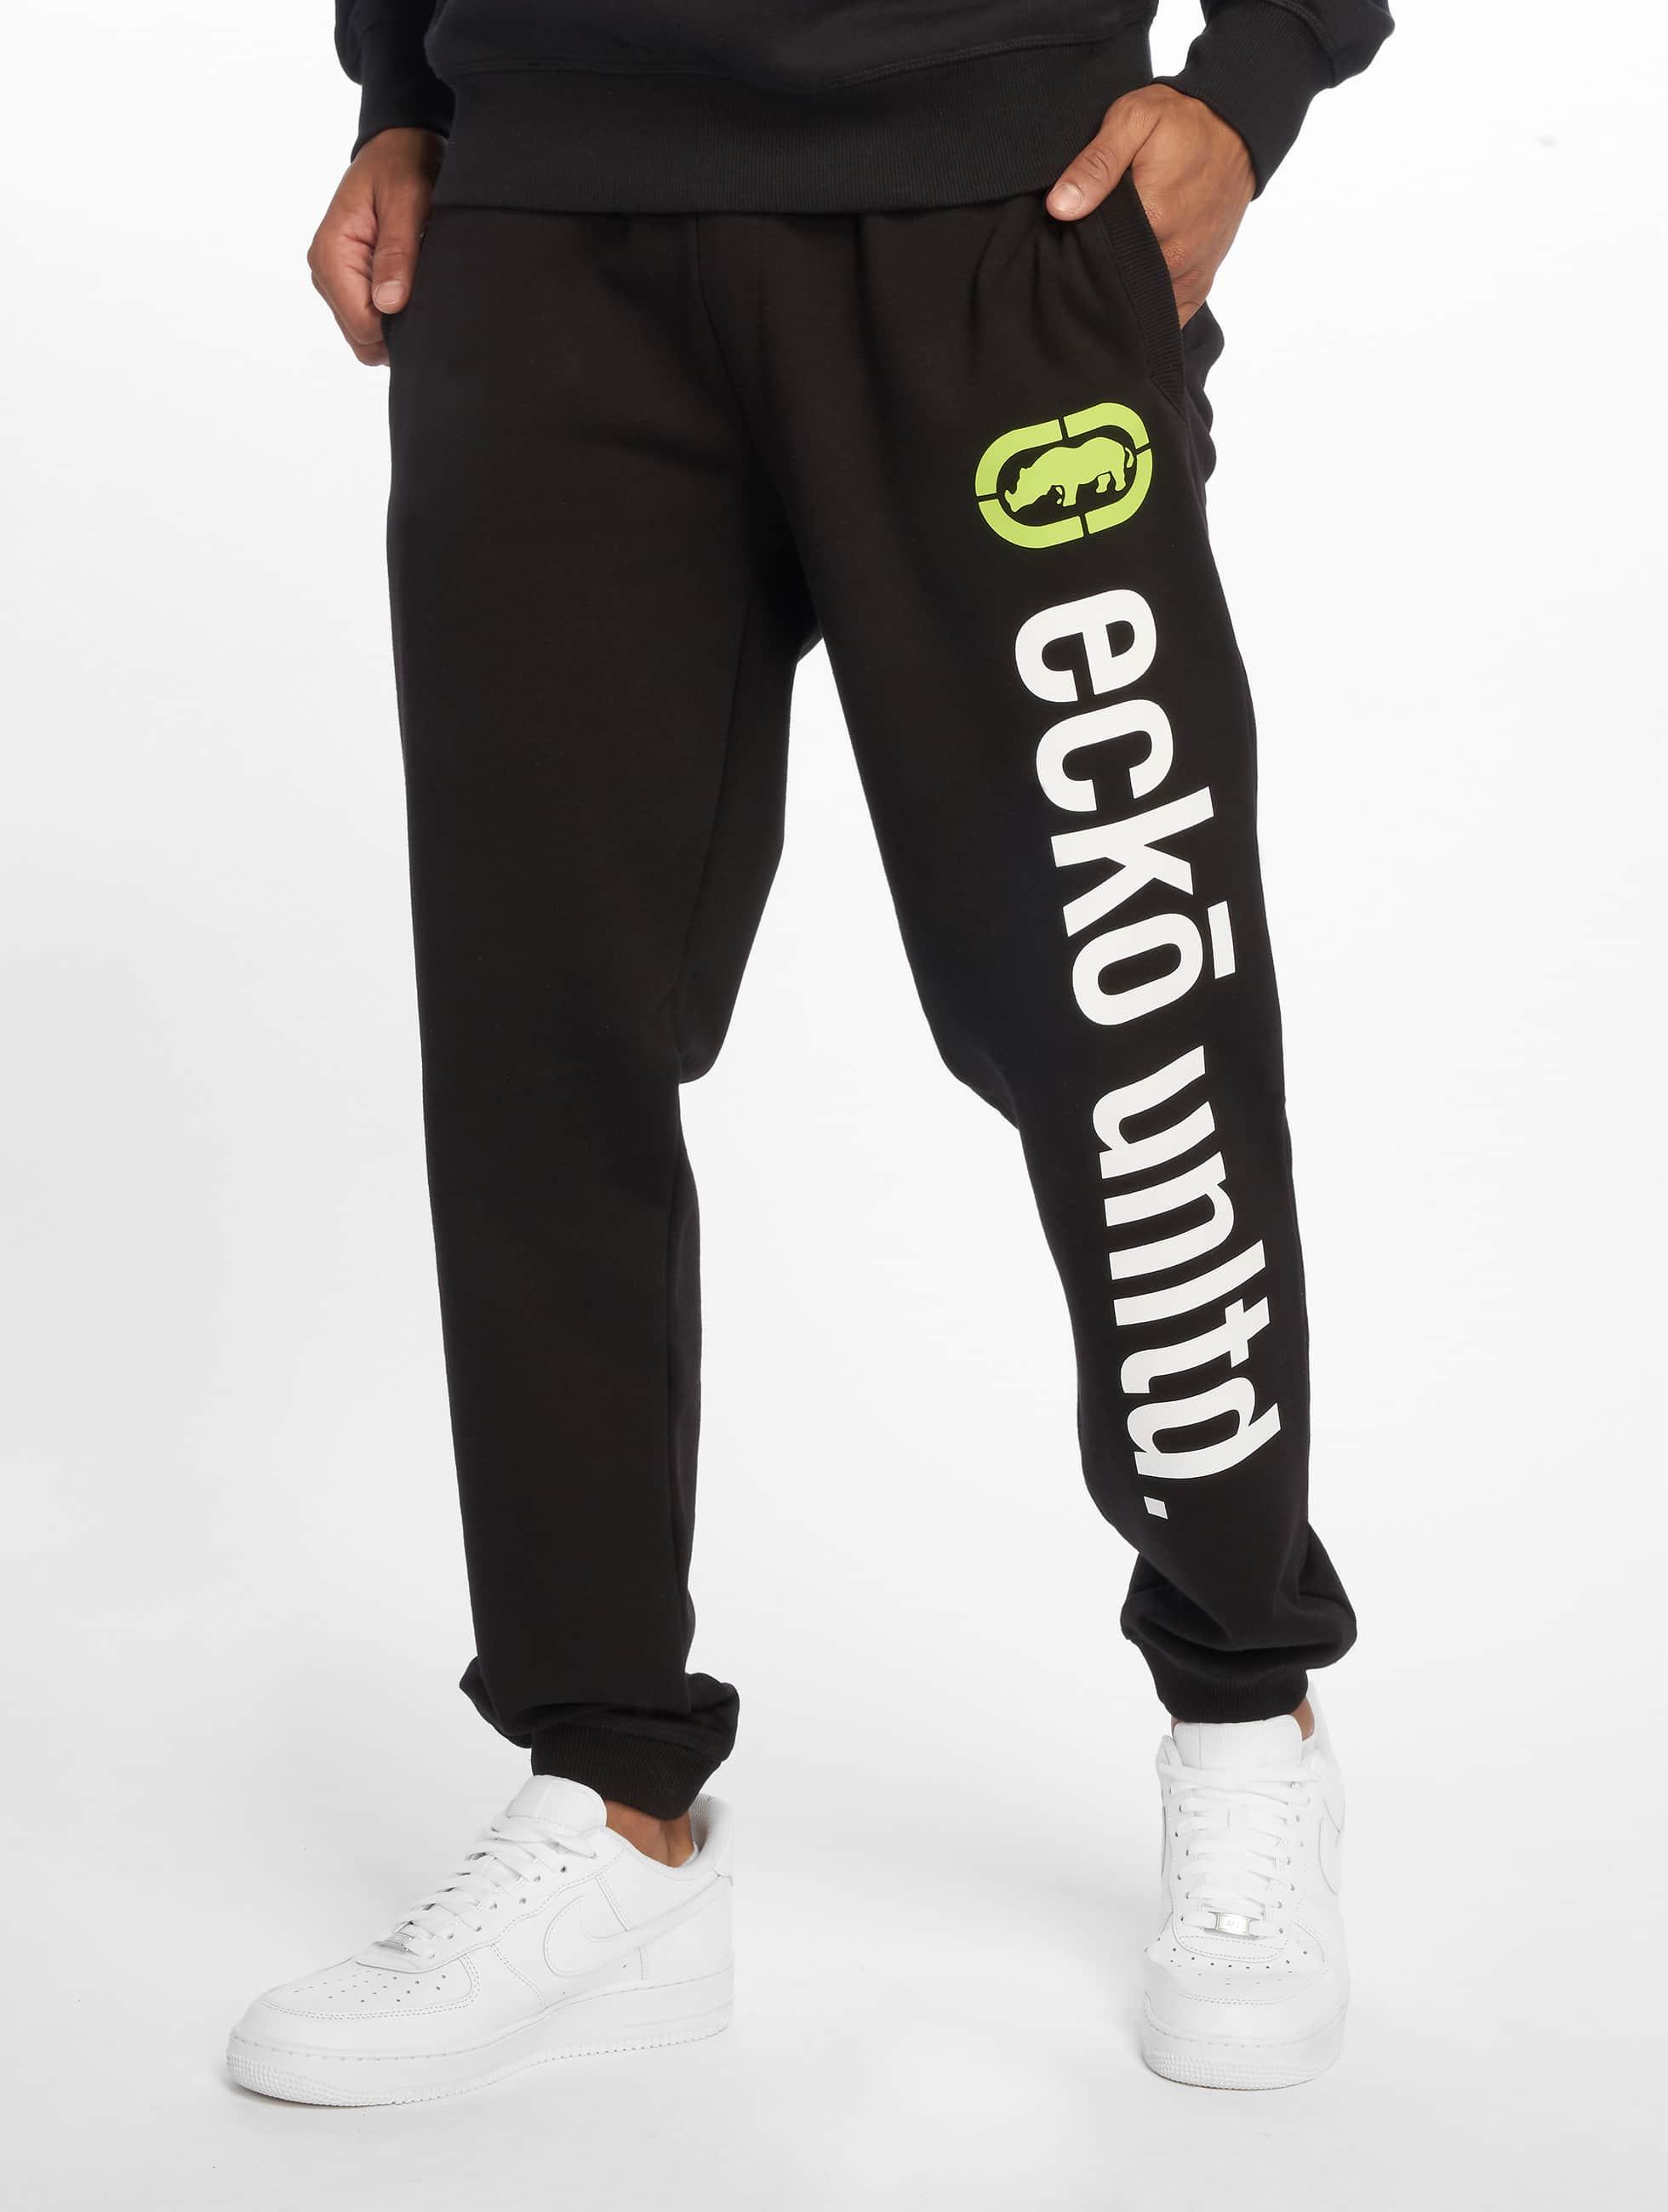 Ecko Unltd. / Sweat Pant 2Face in black S